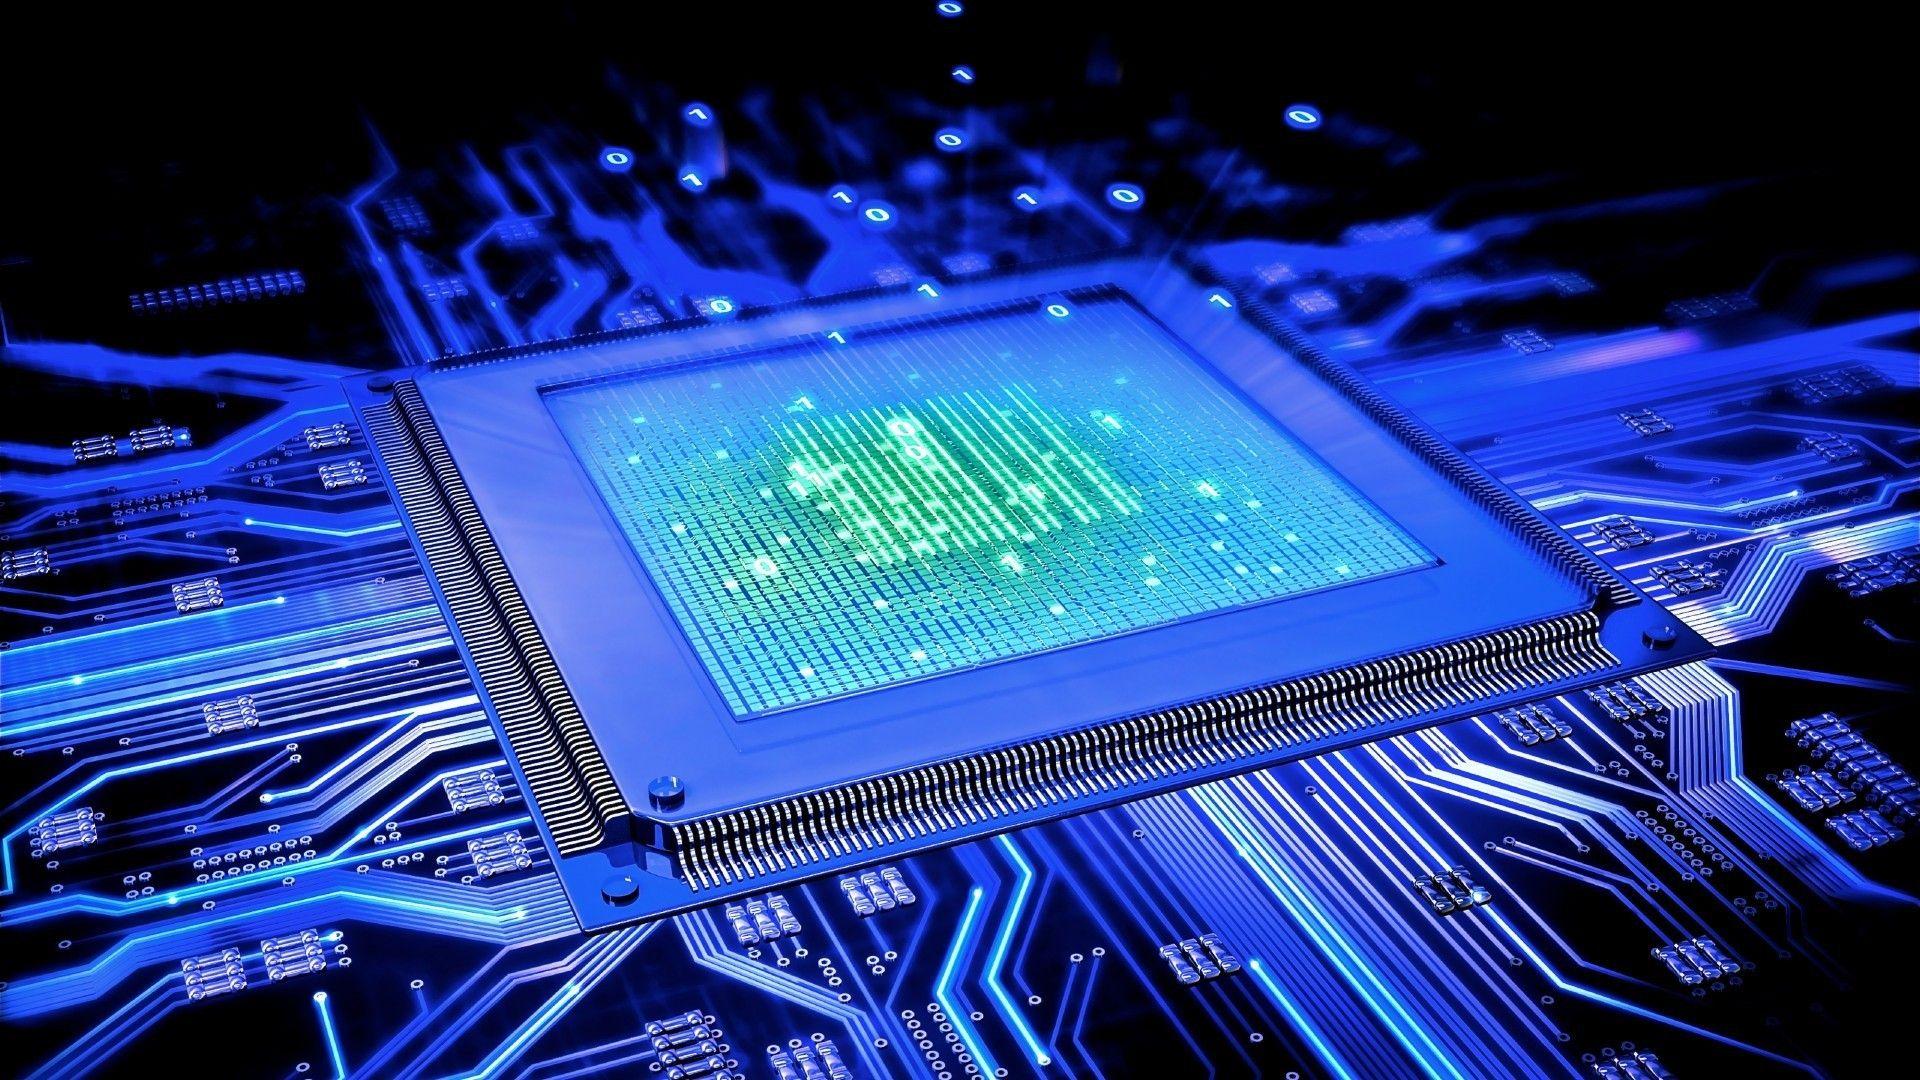 Motherboard Blue Circuits Circuit Board computer wallpaper